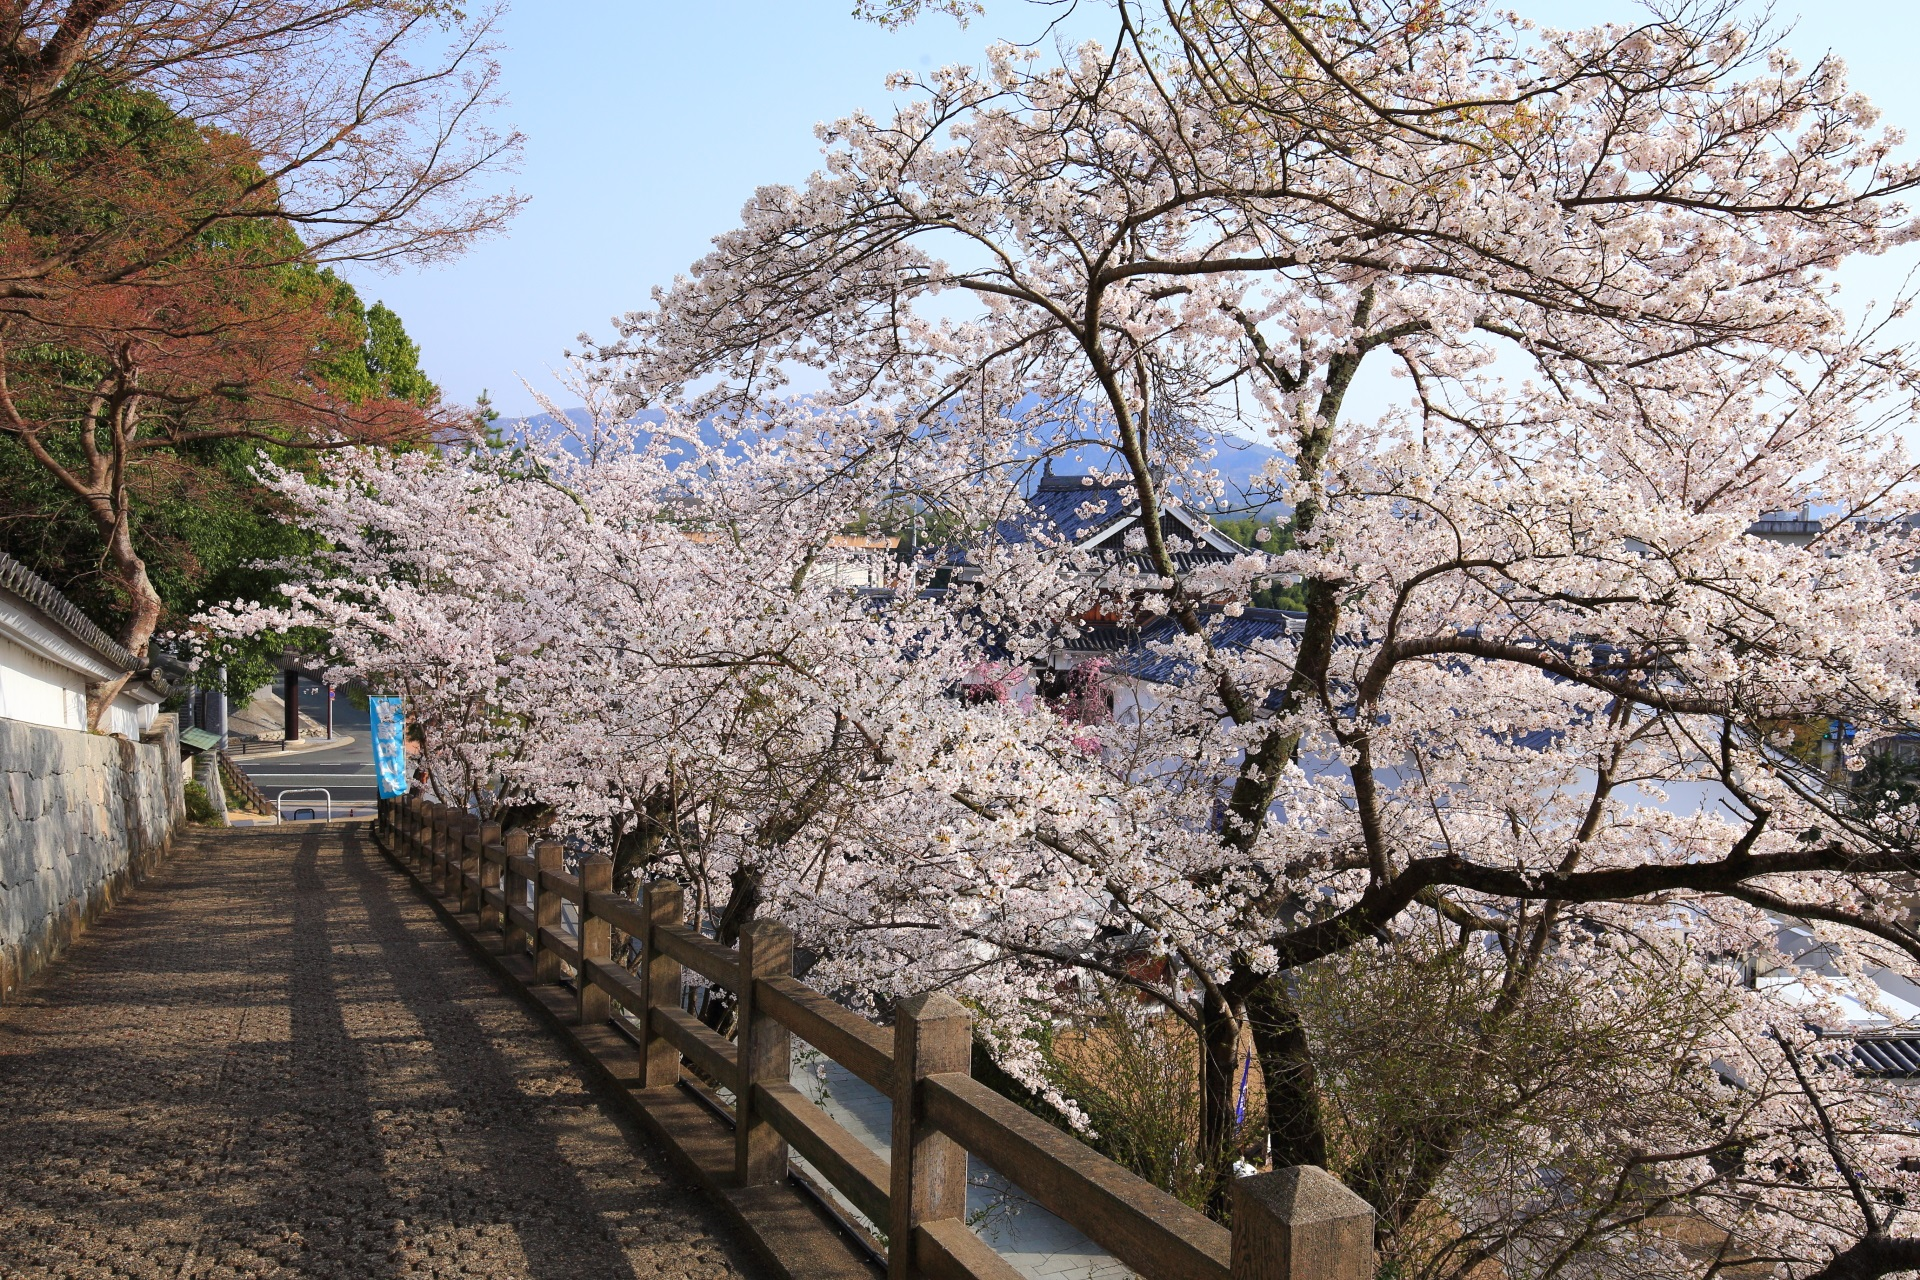 福知山城東側の登城道(登城路)の桜